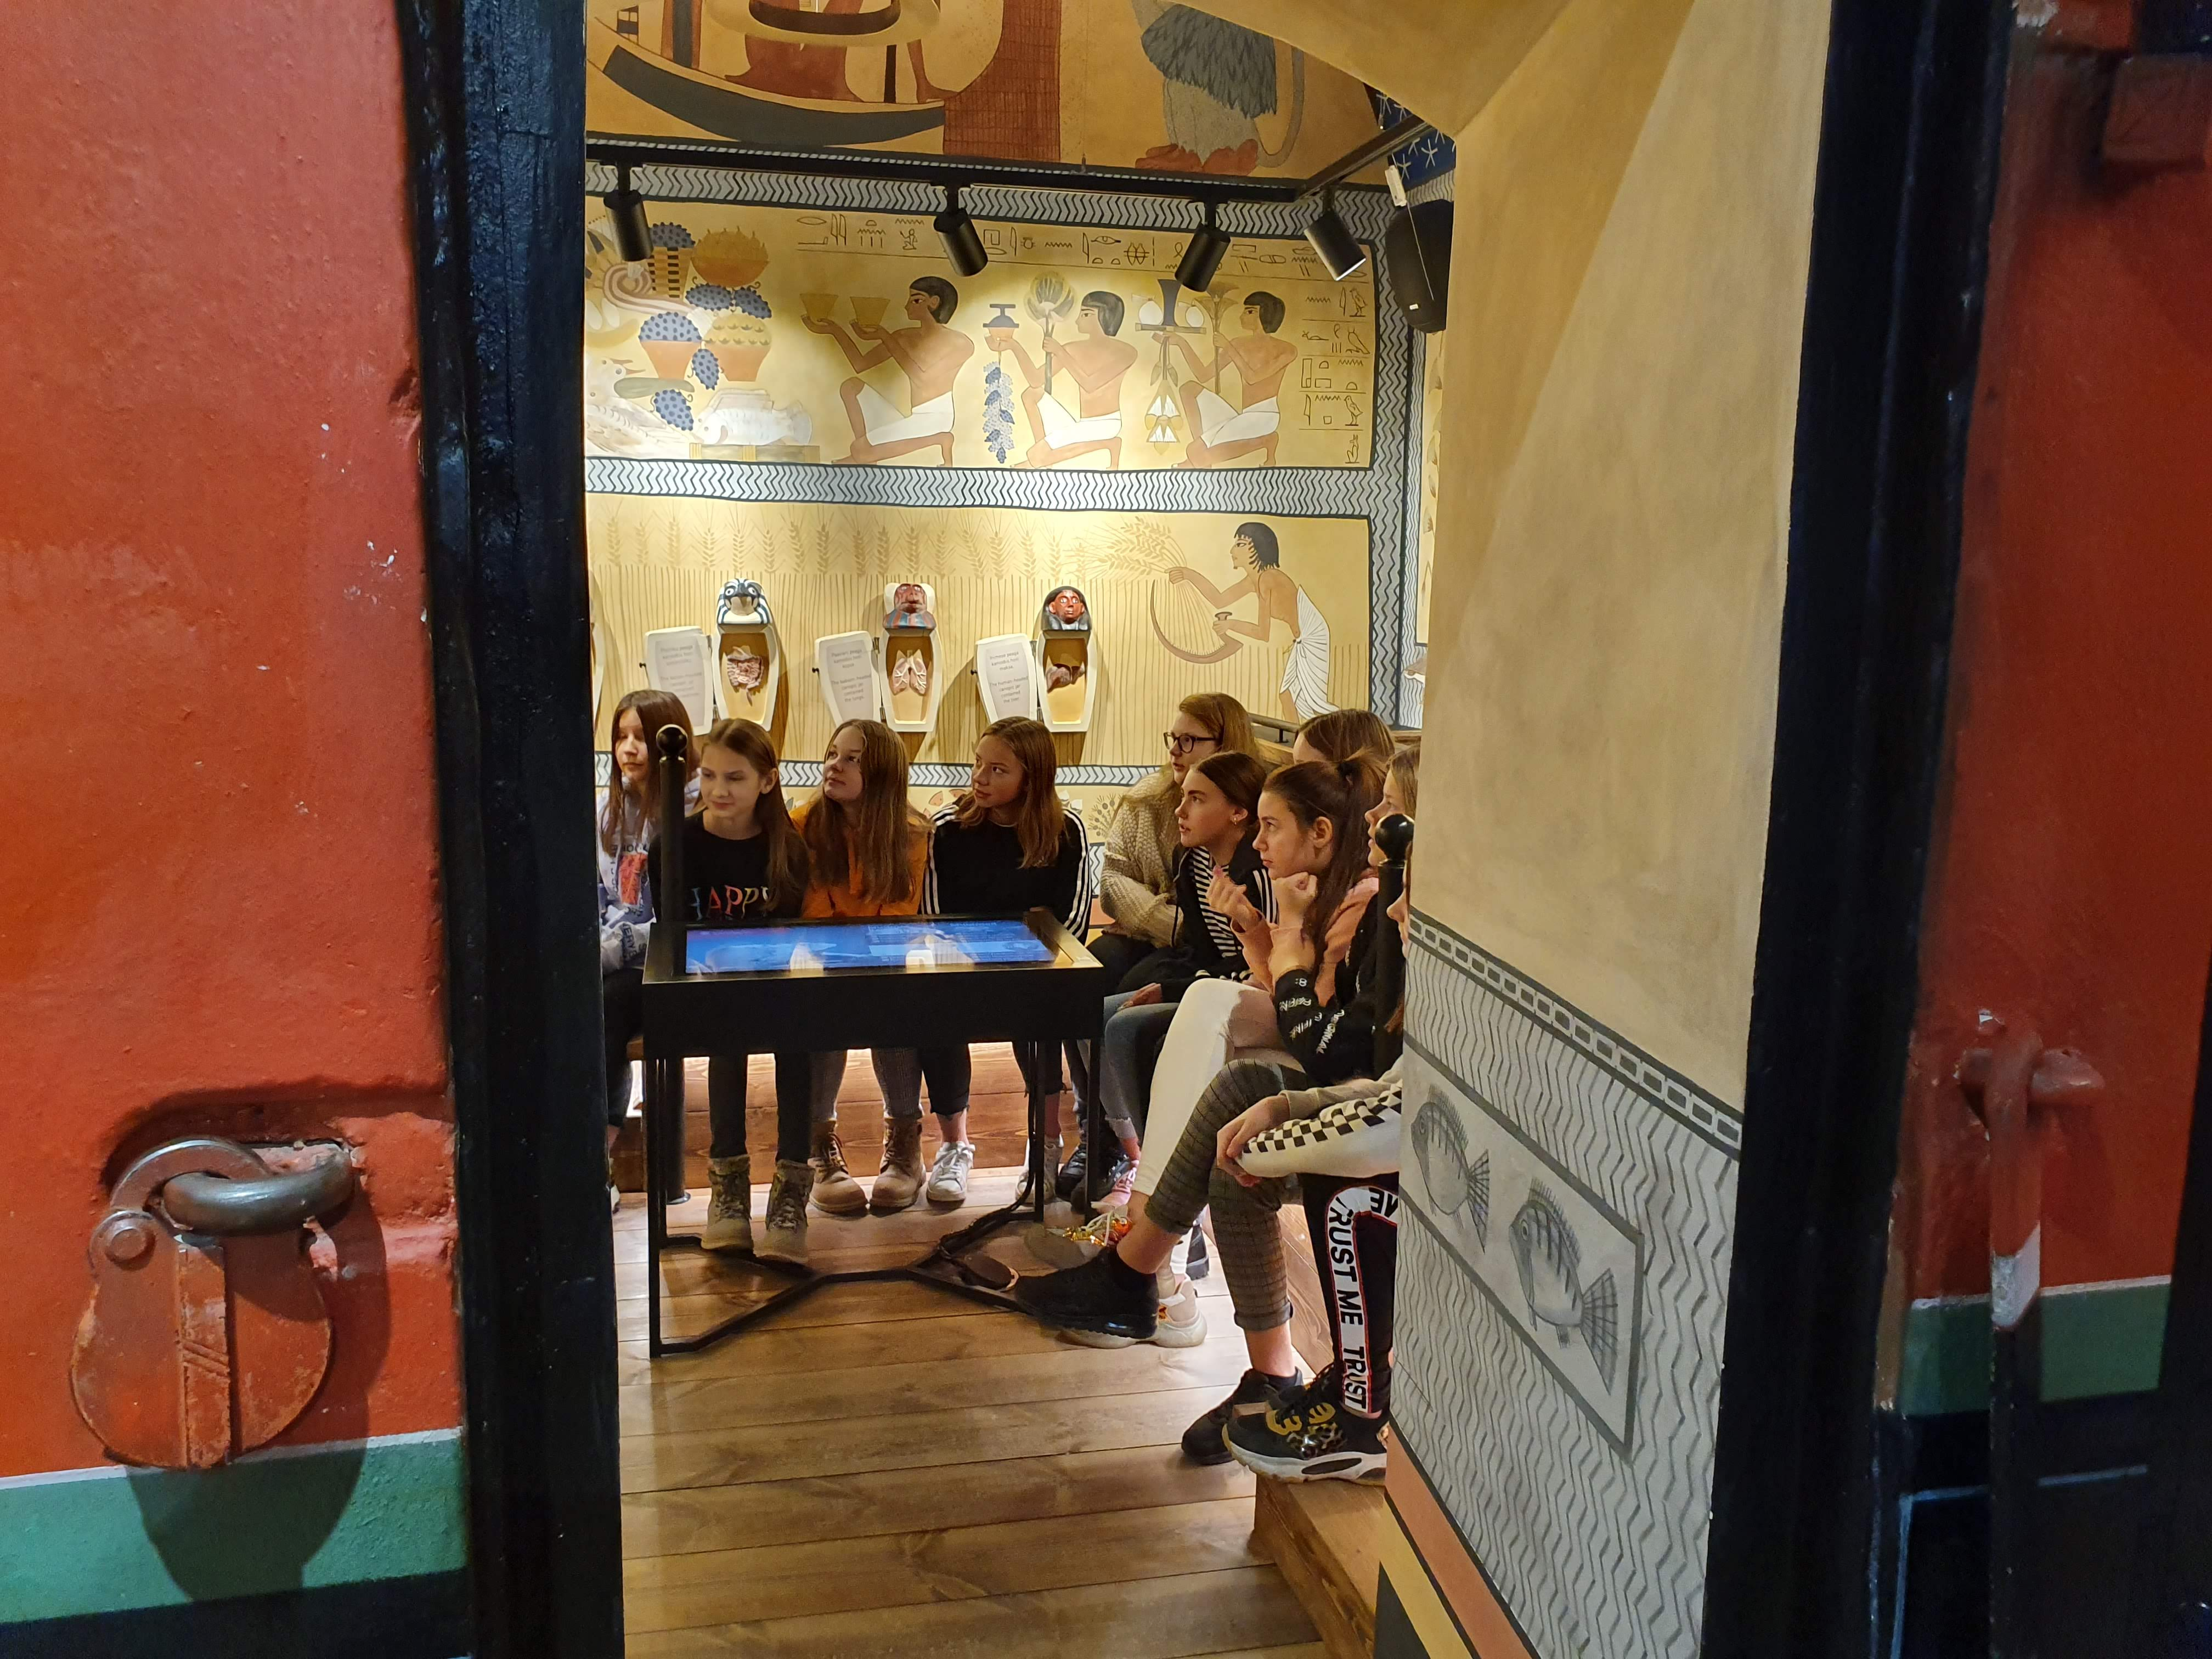 6. klass külastas TÜ kunstimuuseumi